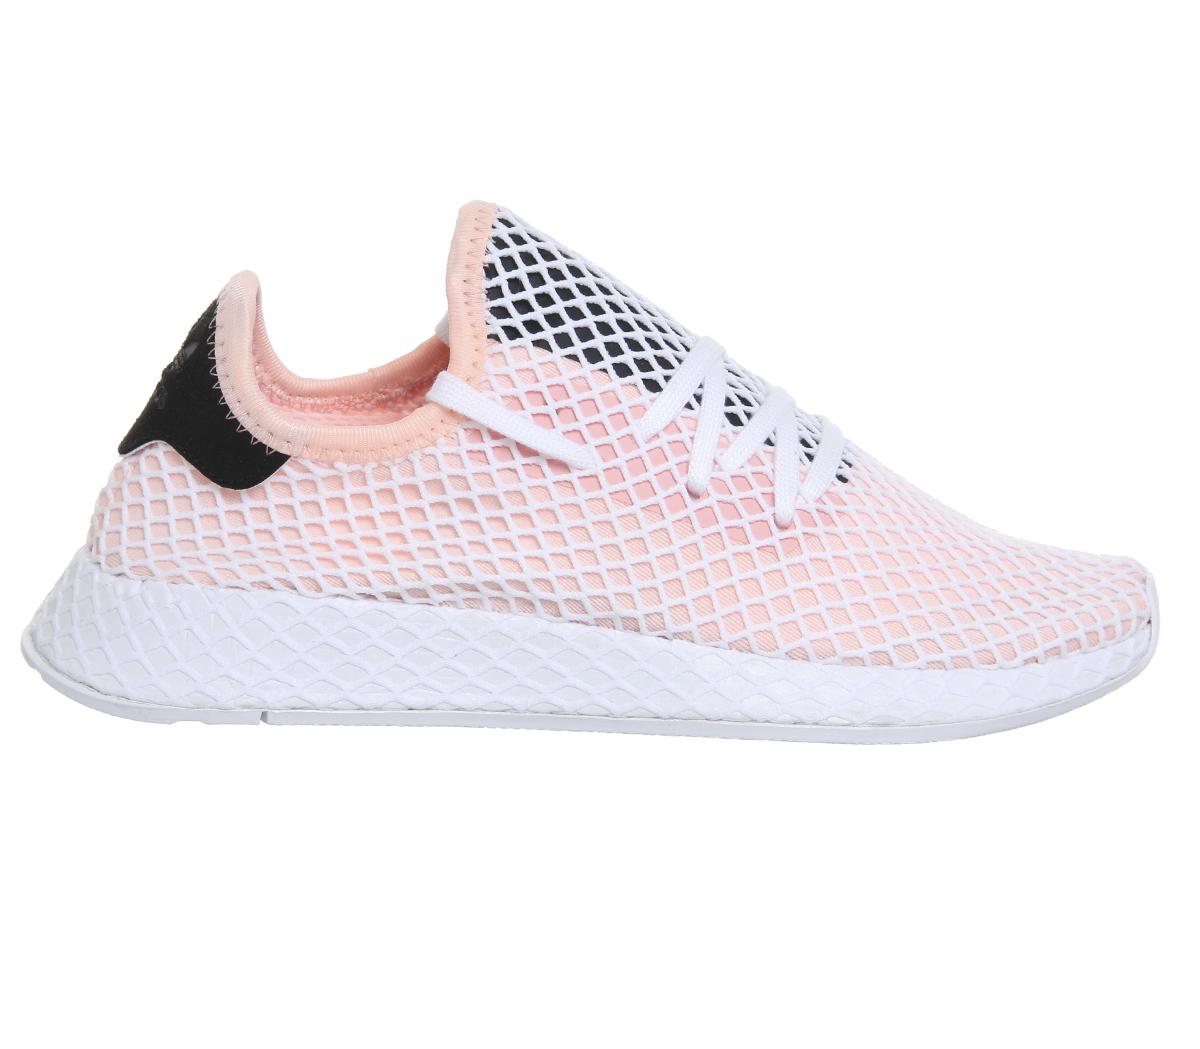 de4432f130b Sentinel Mens Adidas Deerupt Trainers Pink White Core Black Trainers Shoes